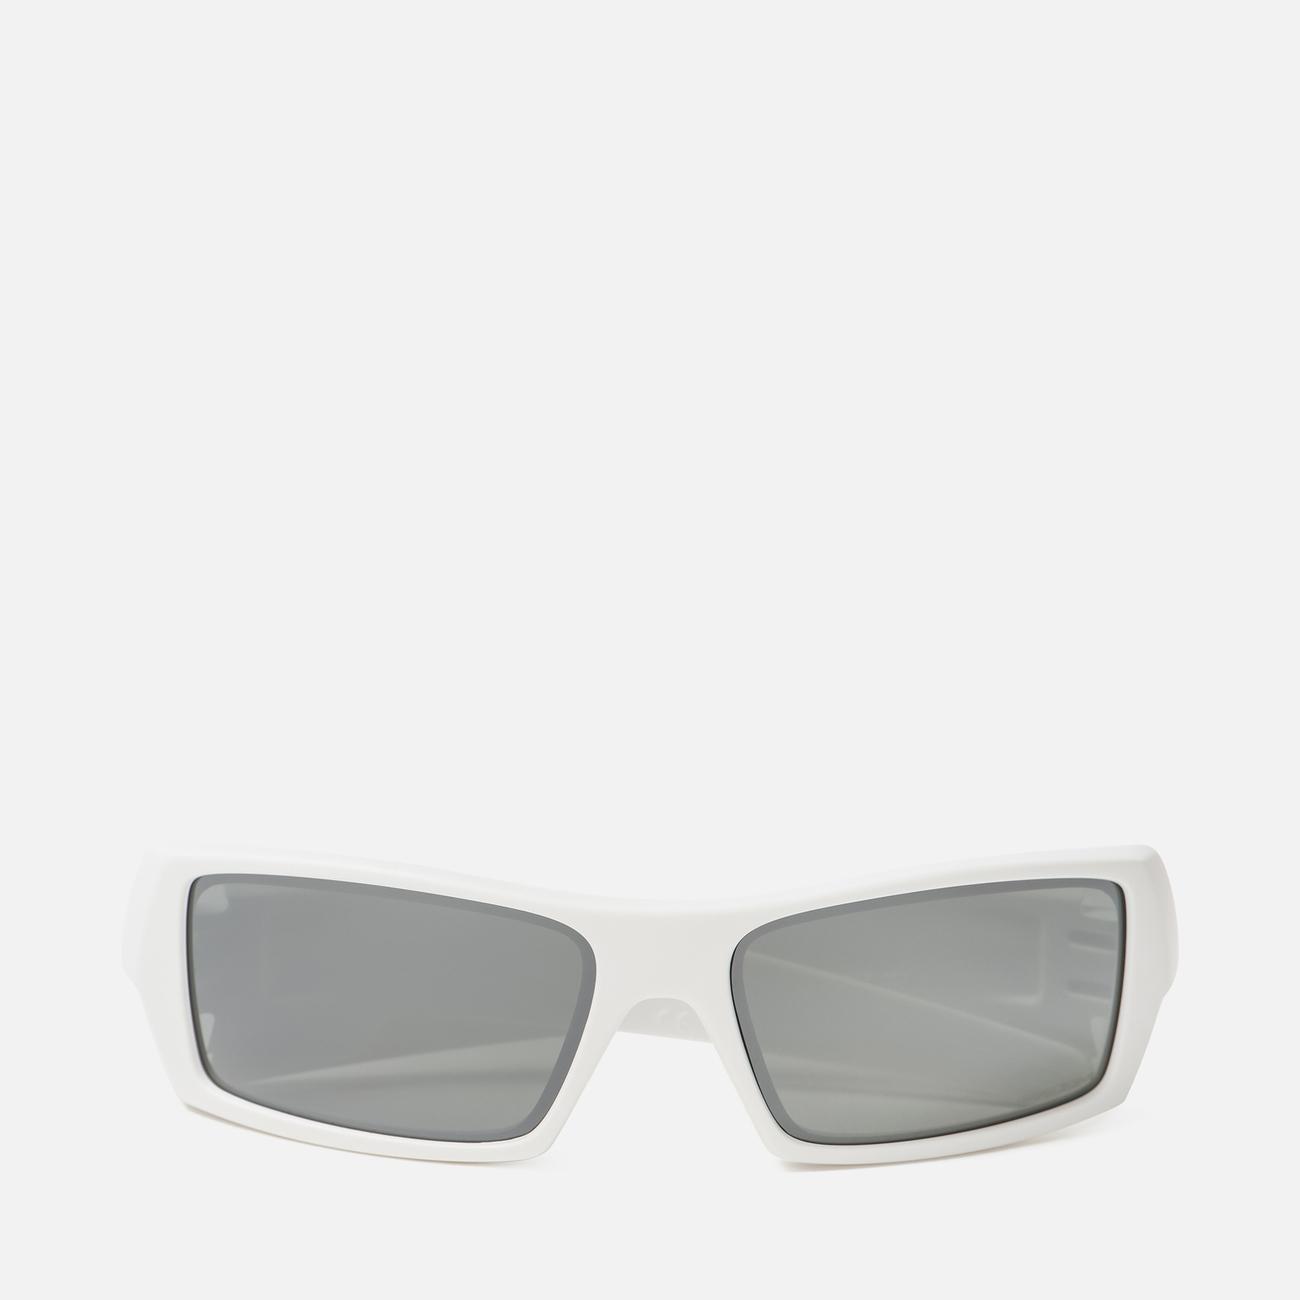 Солнцезащитные очки Oakley Gascan Matte White/Prizm Black